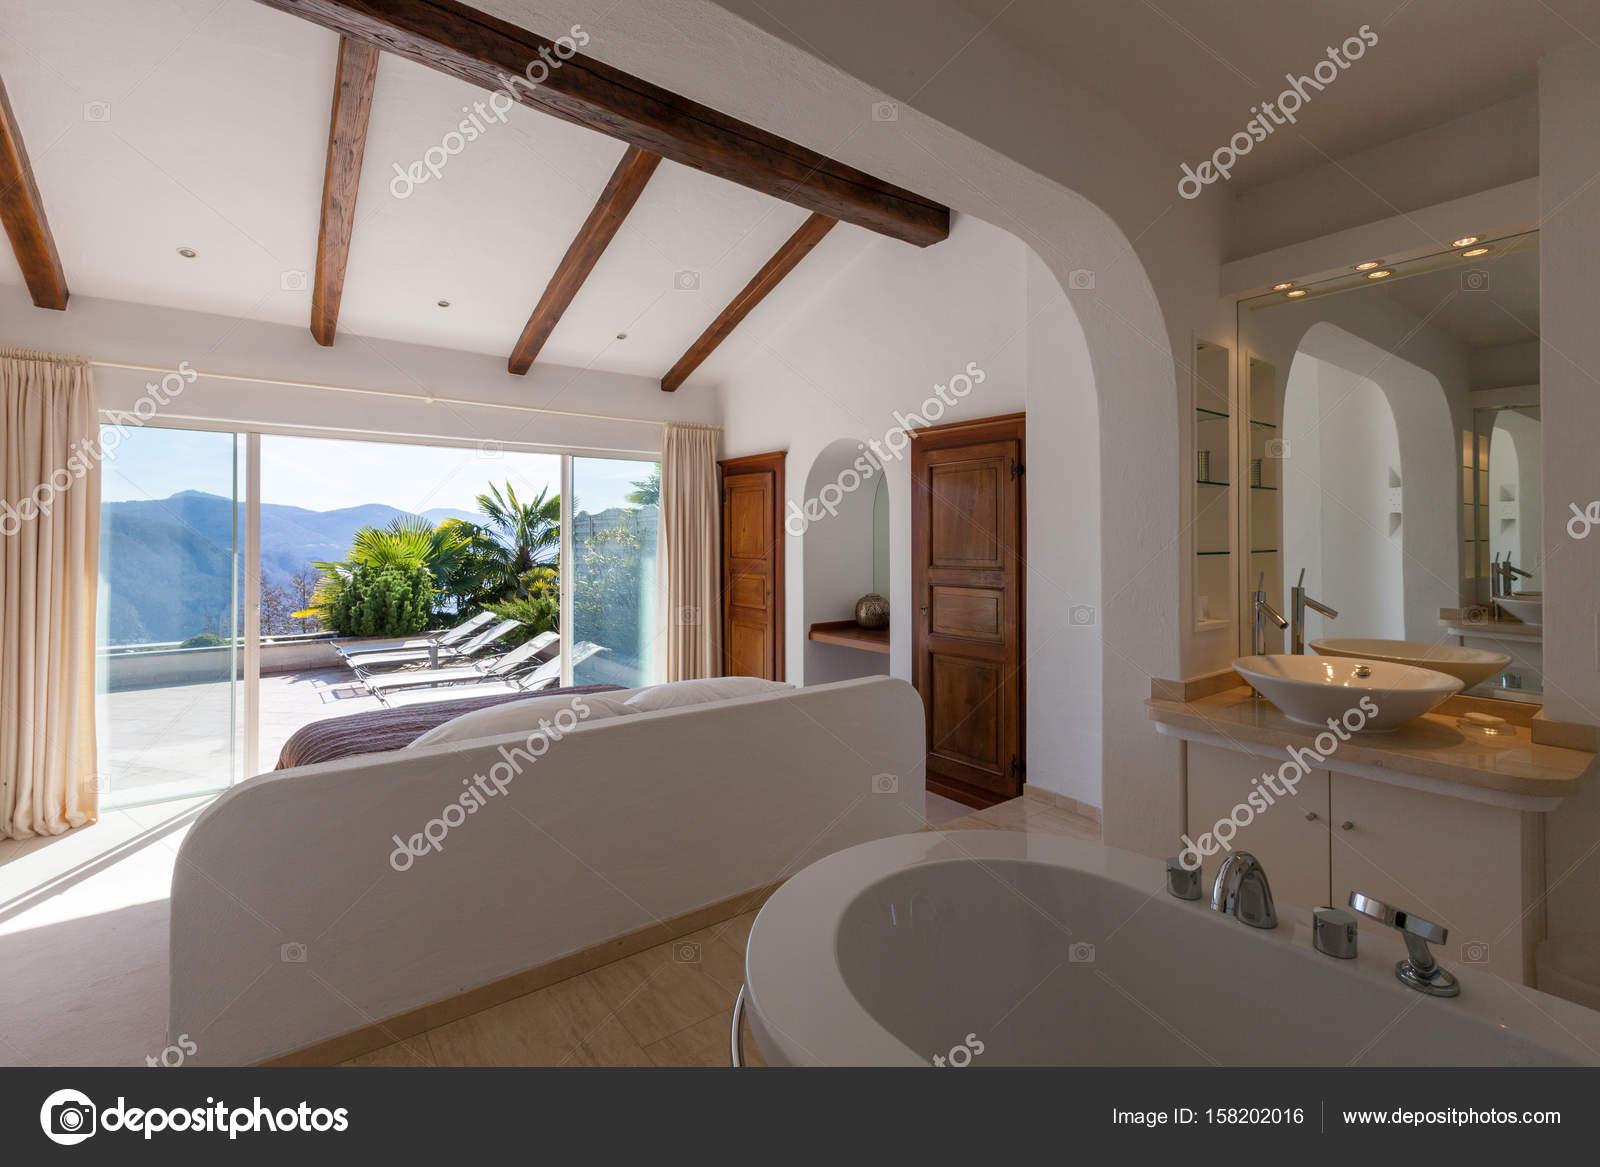 https://st3.depositphotos.com/2018053/15820/i/1600/depositphotos_158202016-stockafbeelding-elegante-slaapkamer-met-bad.jpg